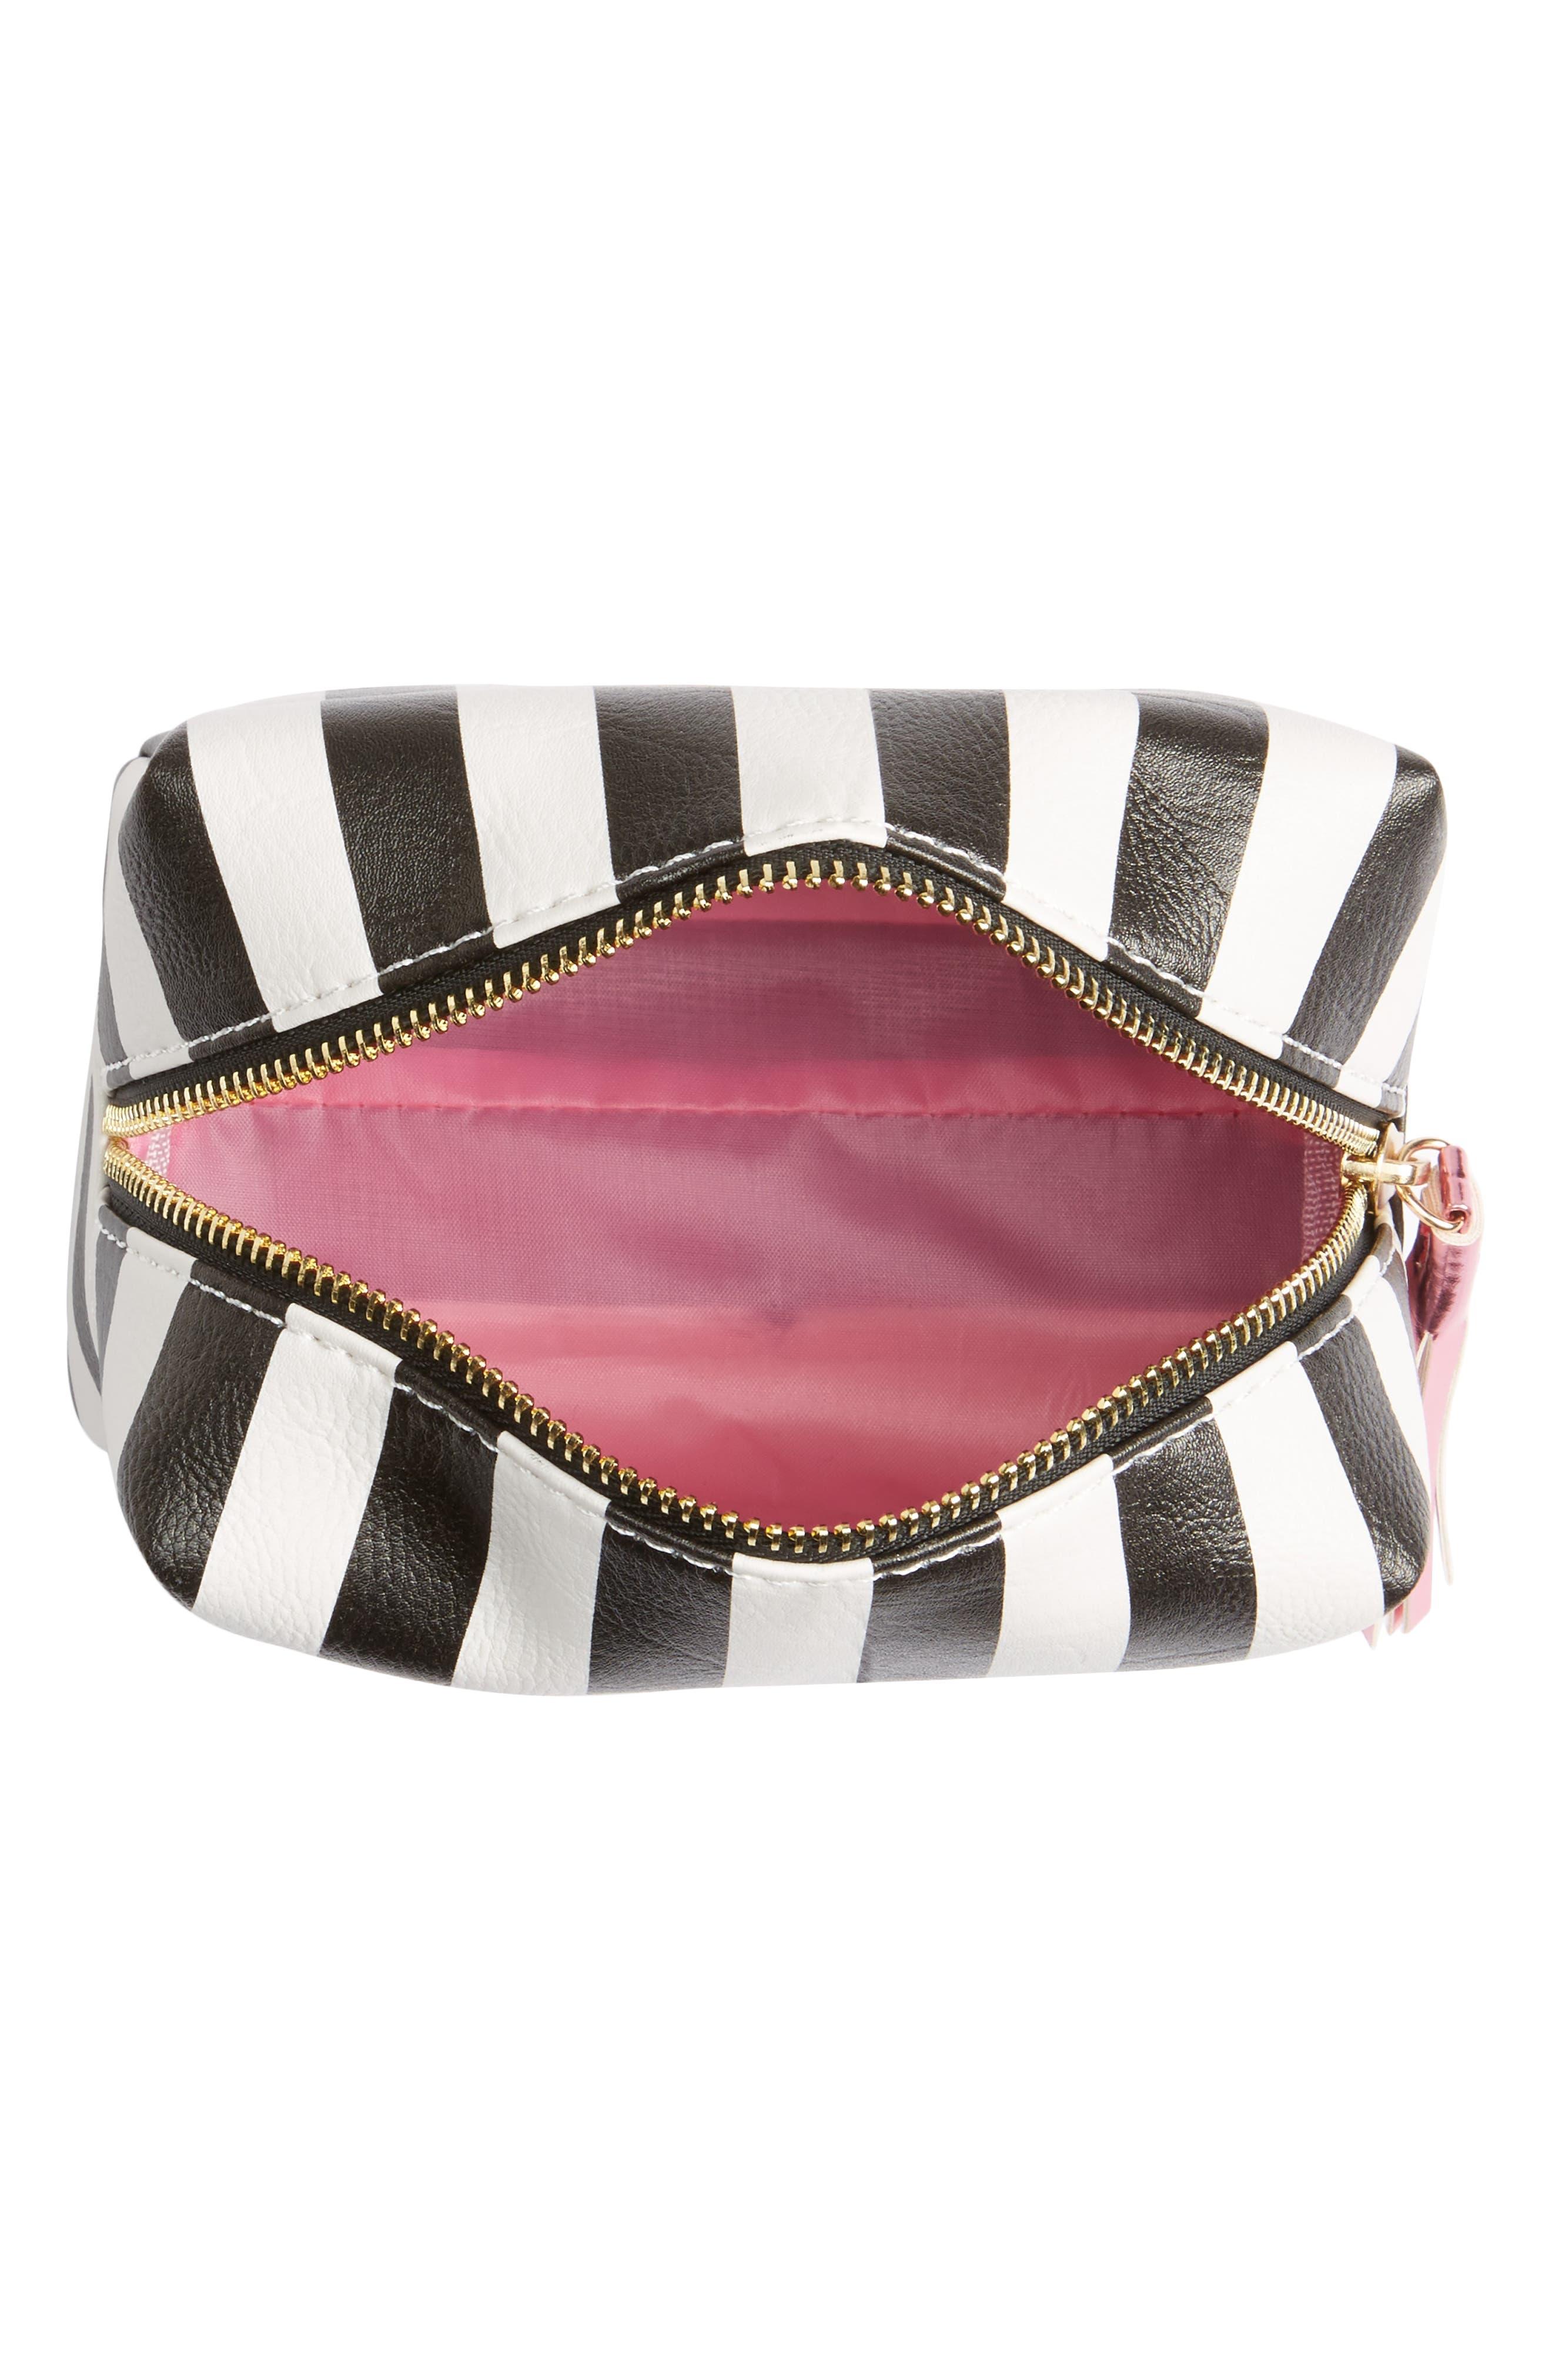 Alternate Image 3  - OMG Metallic Lip Stripe Cosmetics Bag